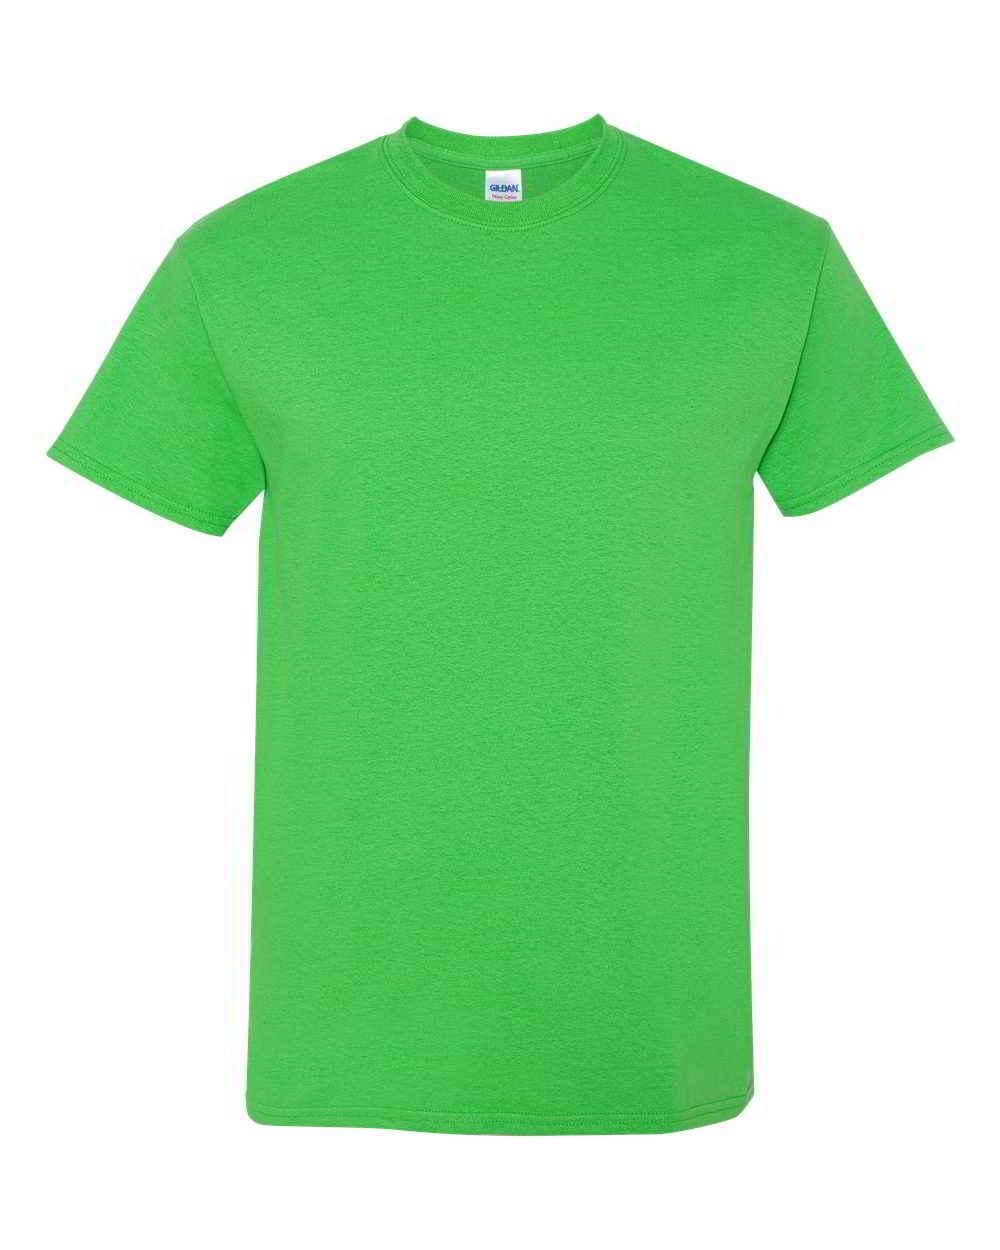 Gildan-Heavy-Cotton-Short-Sleeve-Mens-Green-T-Shirts-5000 thumbnail 4